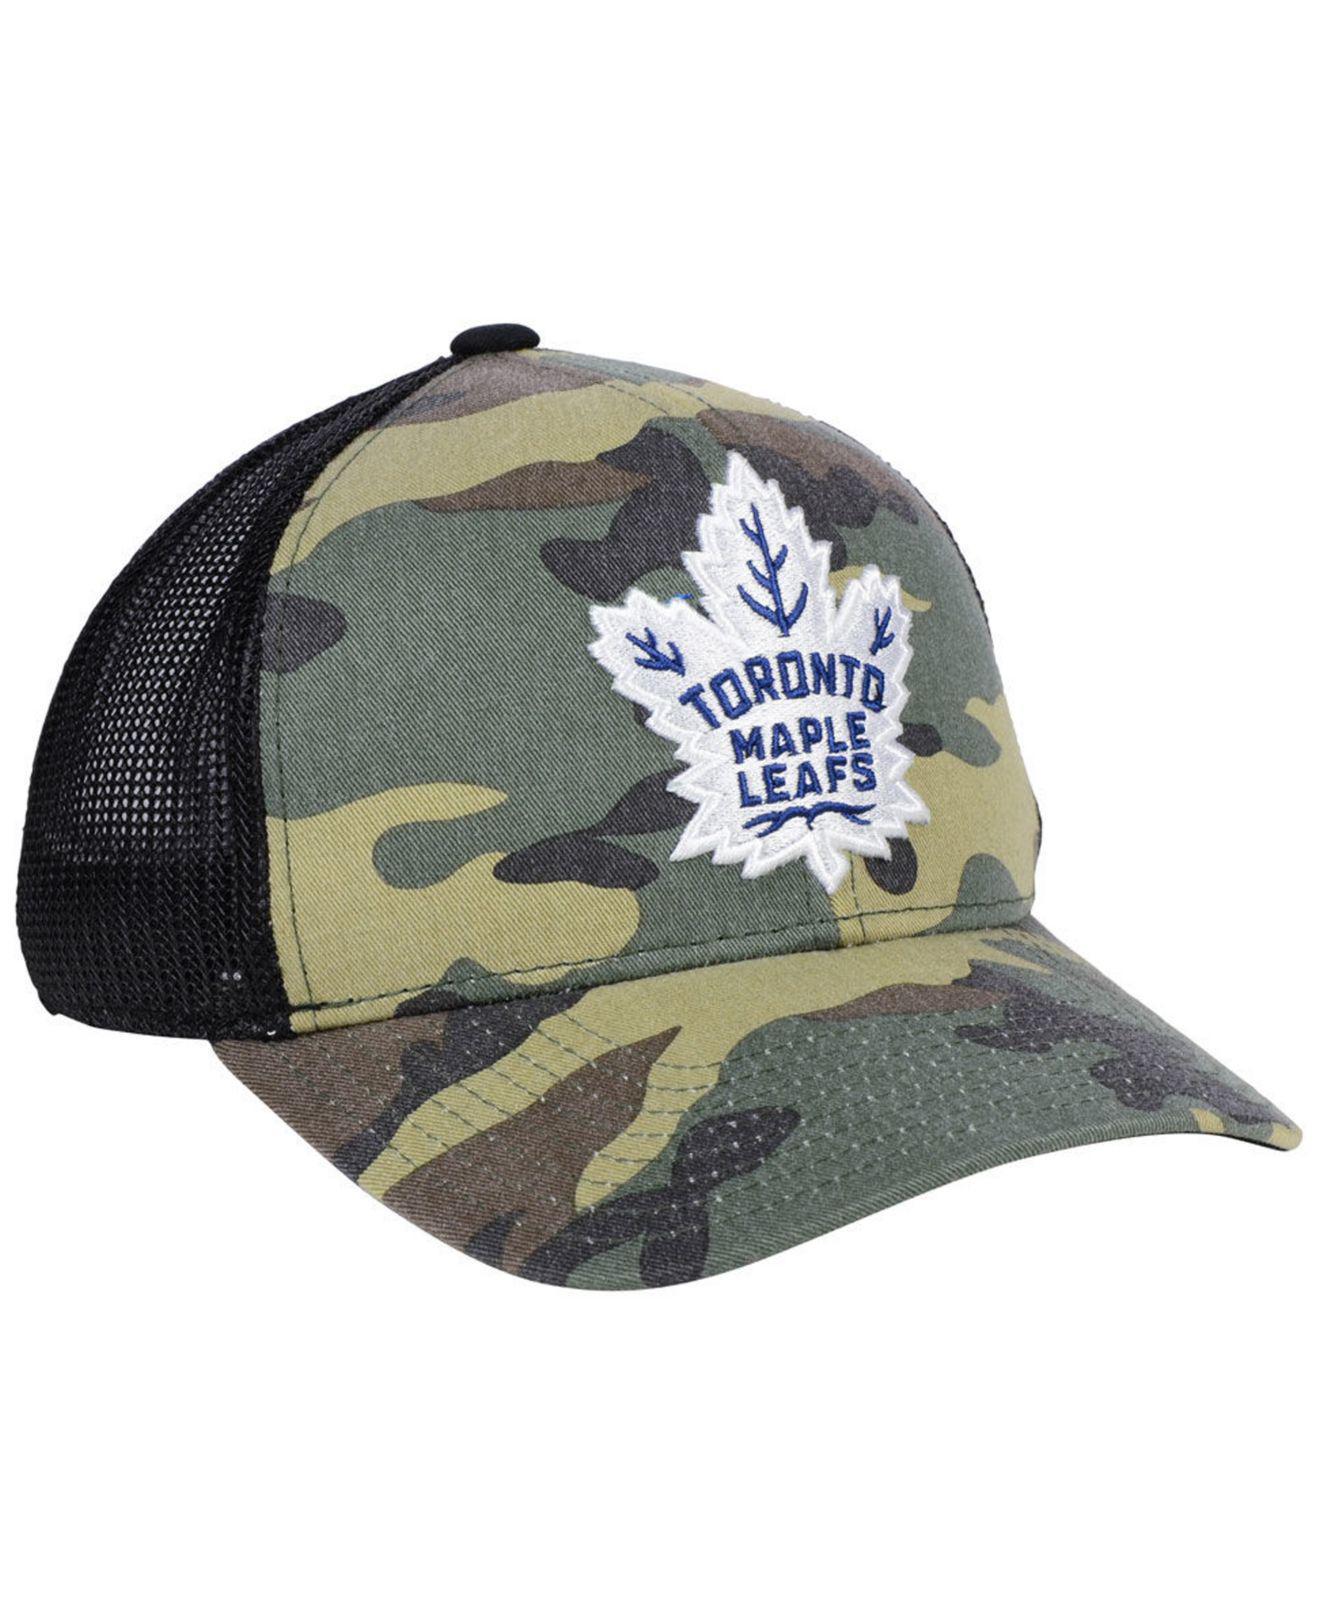 657fc9e1017 Lyst - adidas Toronto Maple Leafs Camo Trucker Cap in Green for Men